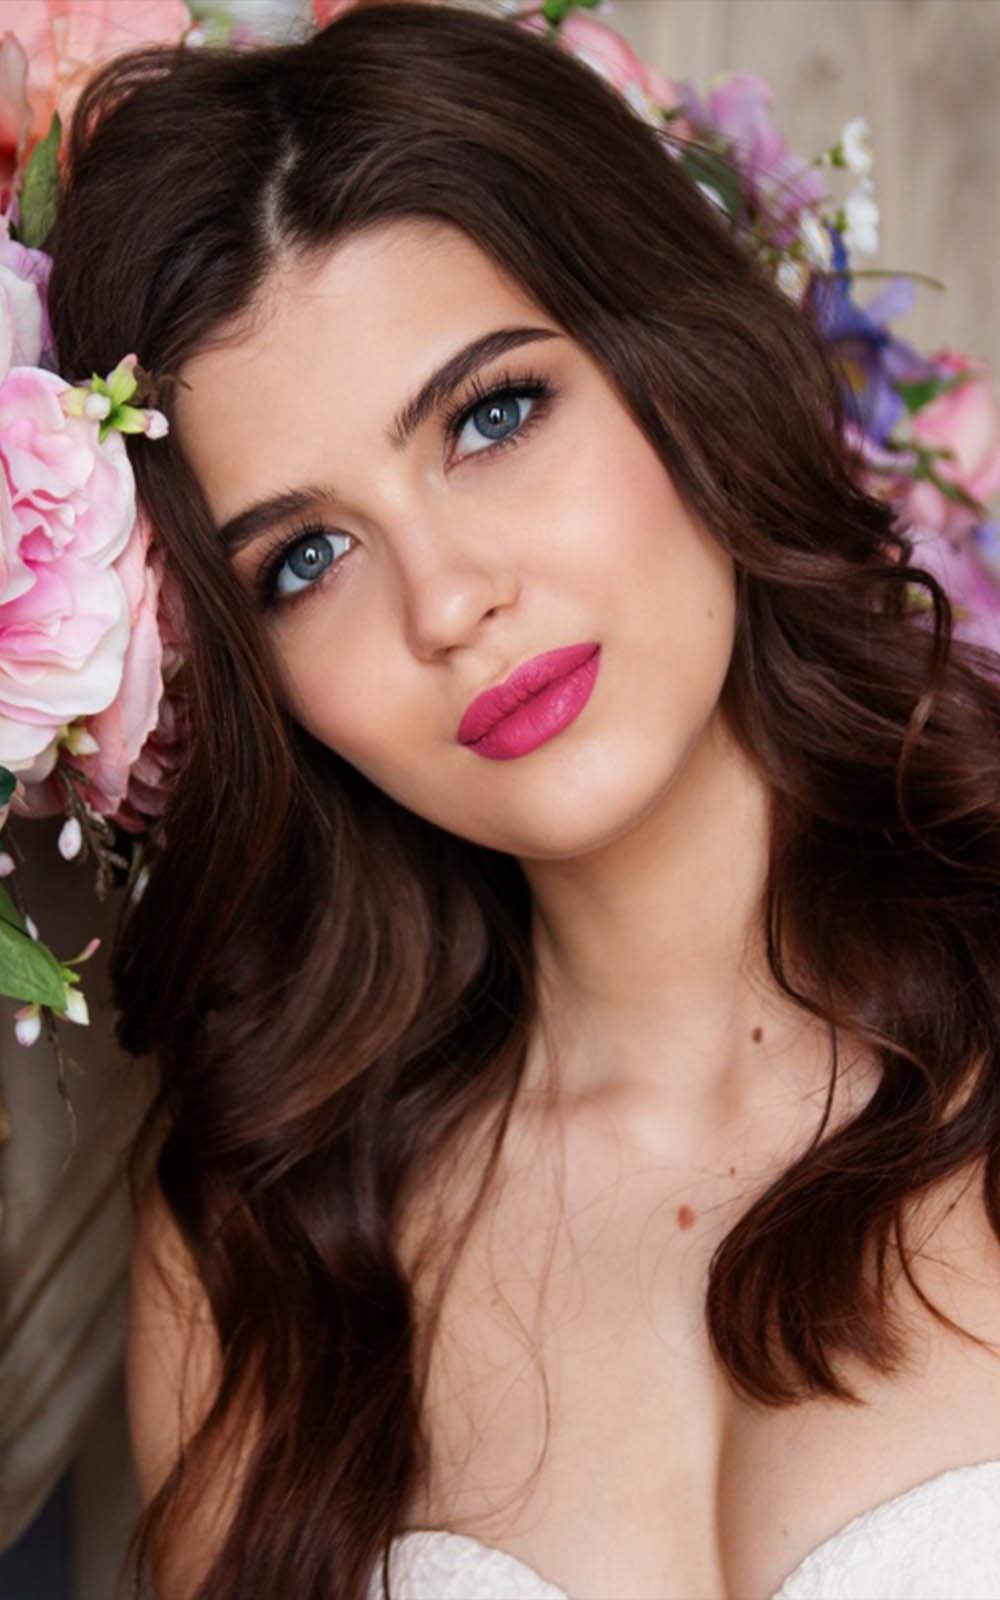 Beautiful Russian Girl - Download Free HD Mobile Wallpapers